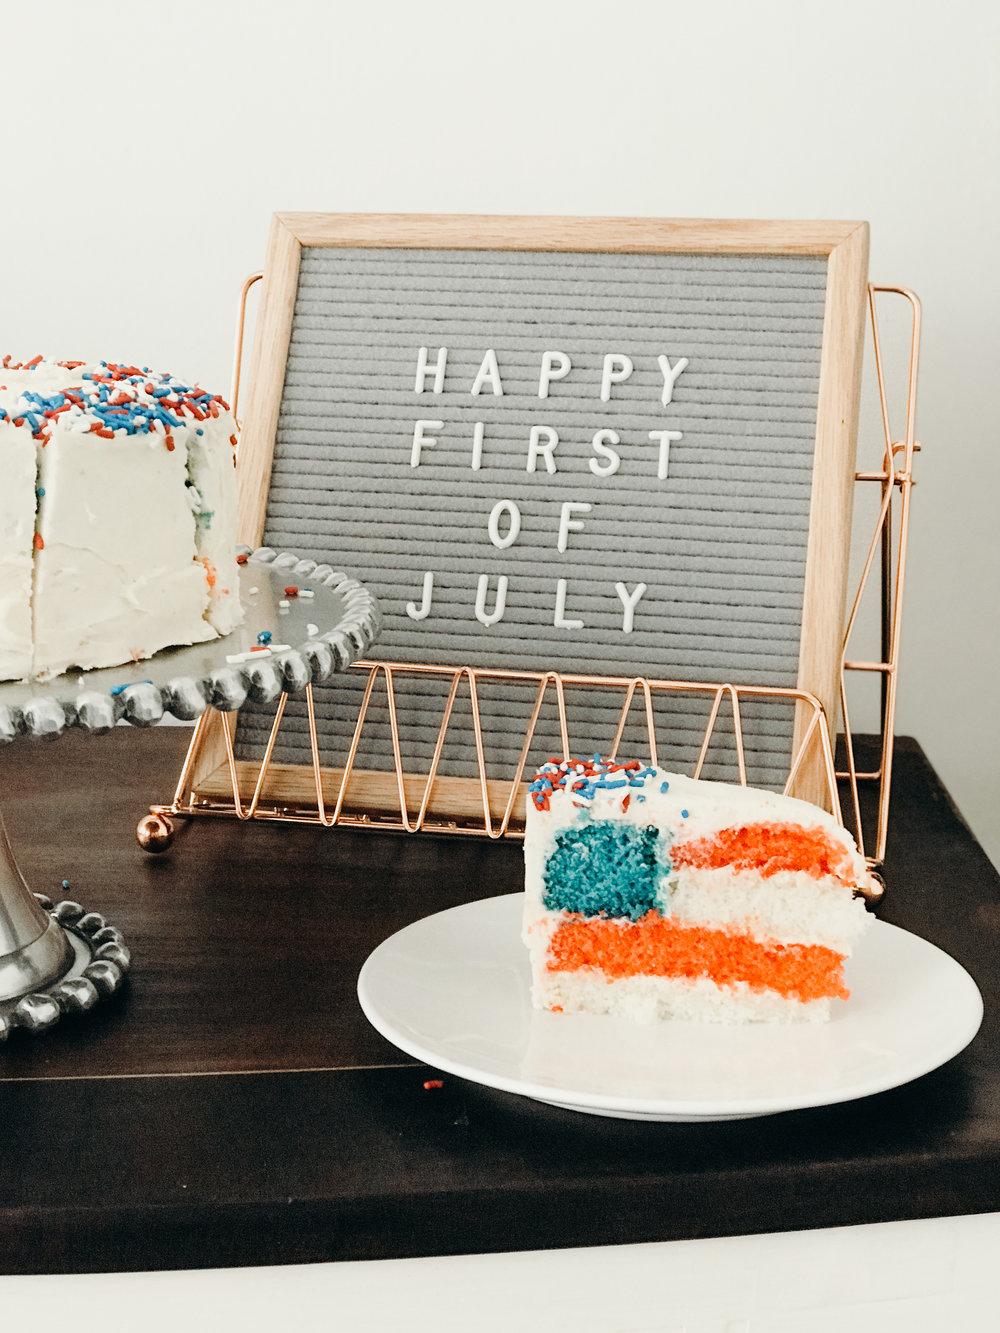 Summer 2018 Highlights - American Flag Cake